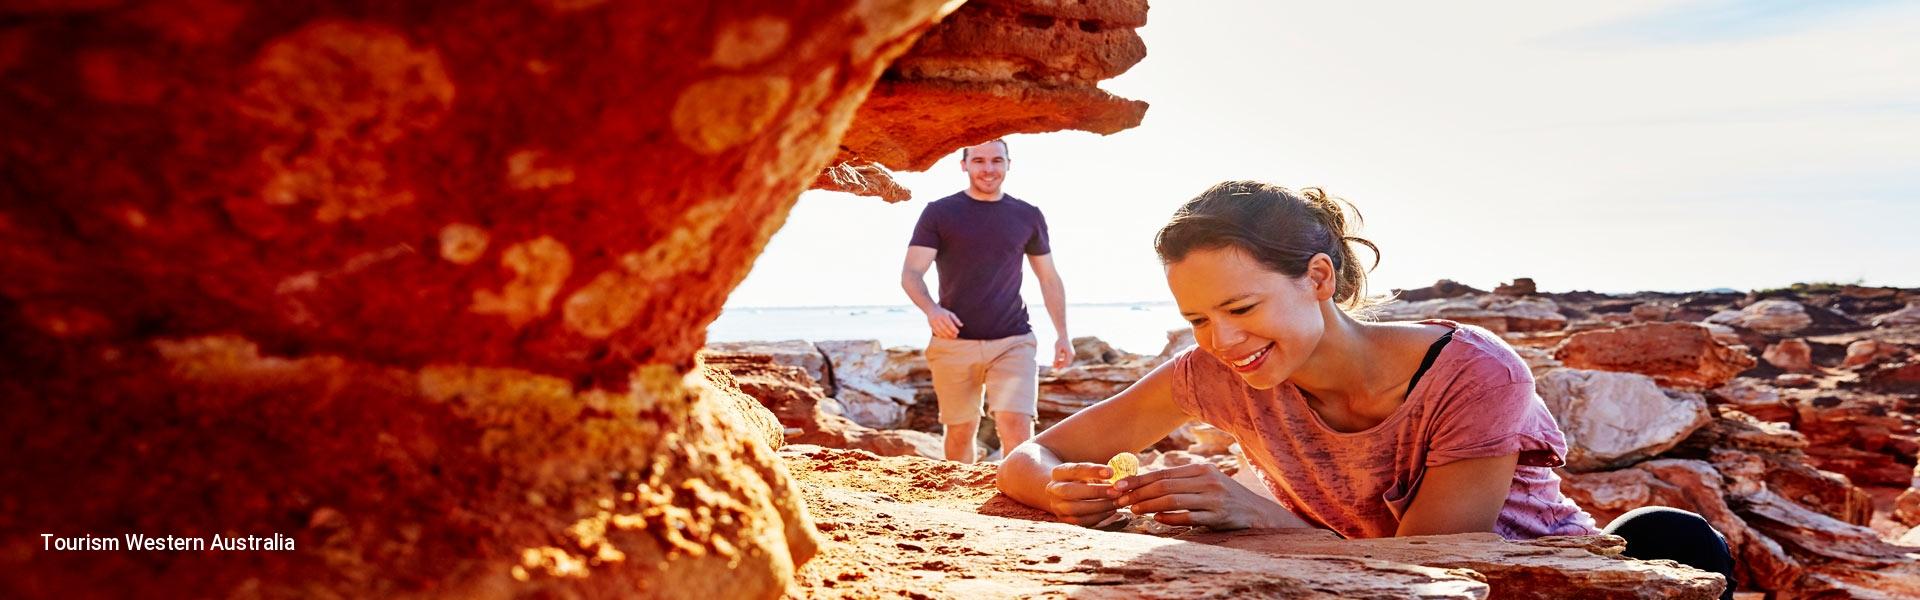 Northern Territory Australia Tour